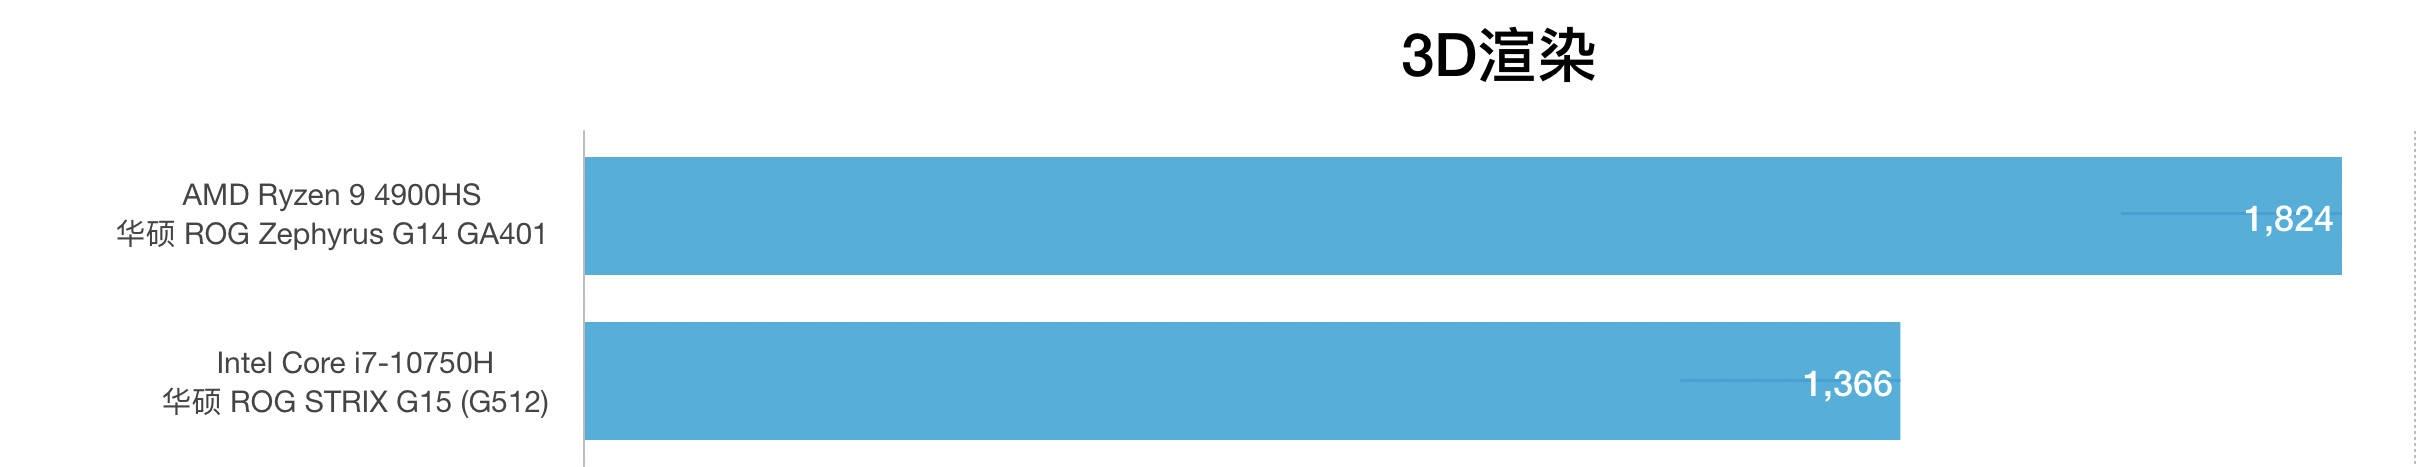 AMD锐龙R9 4900HS和i7-10750H性能跑分对比评测